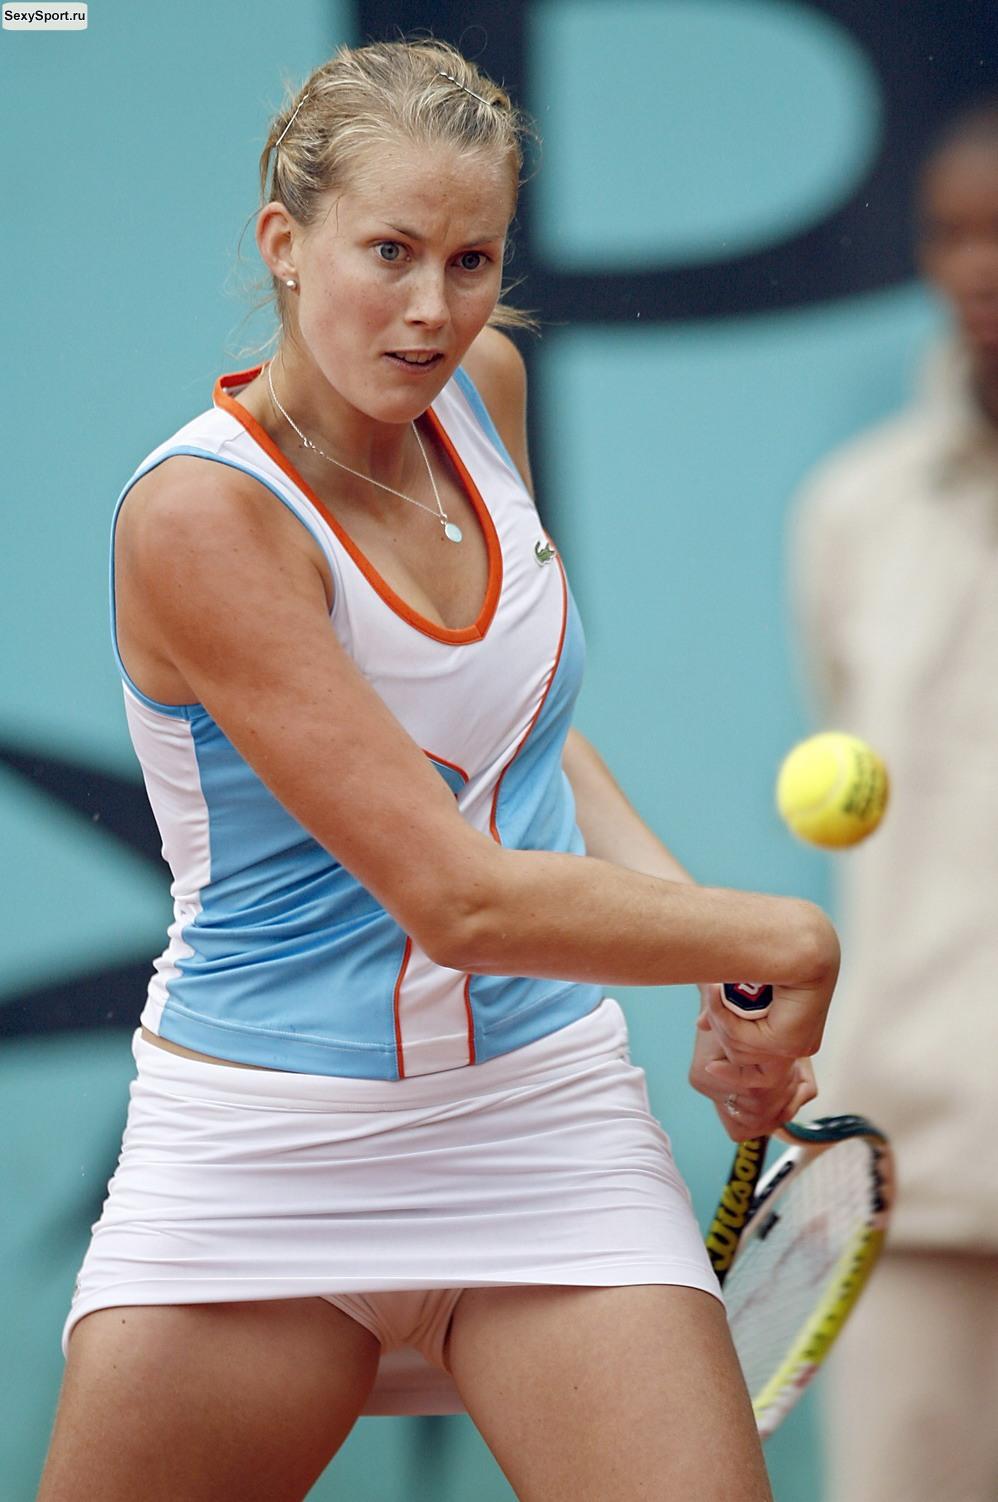 Тенисистка без трусов